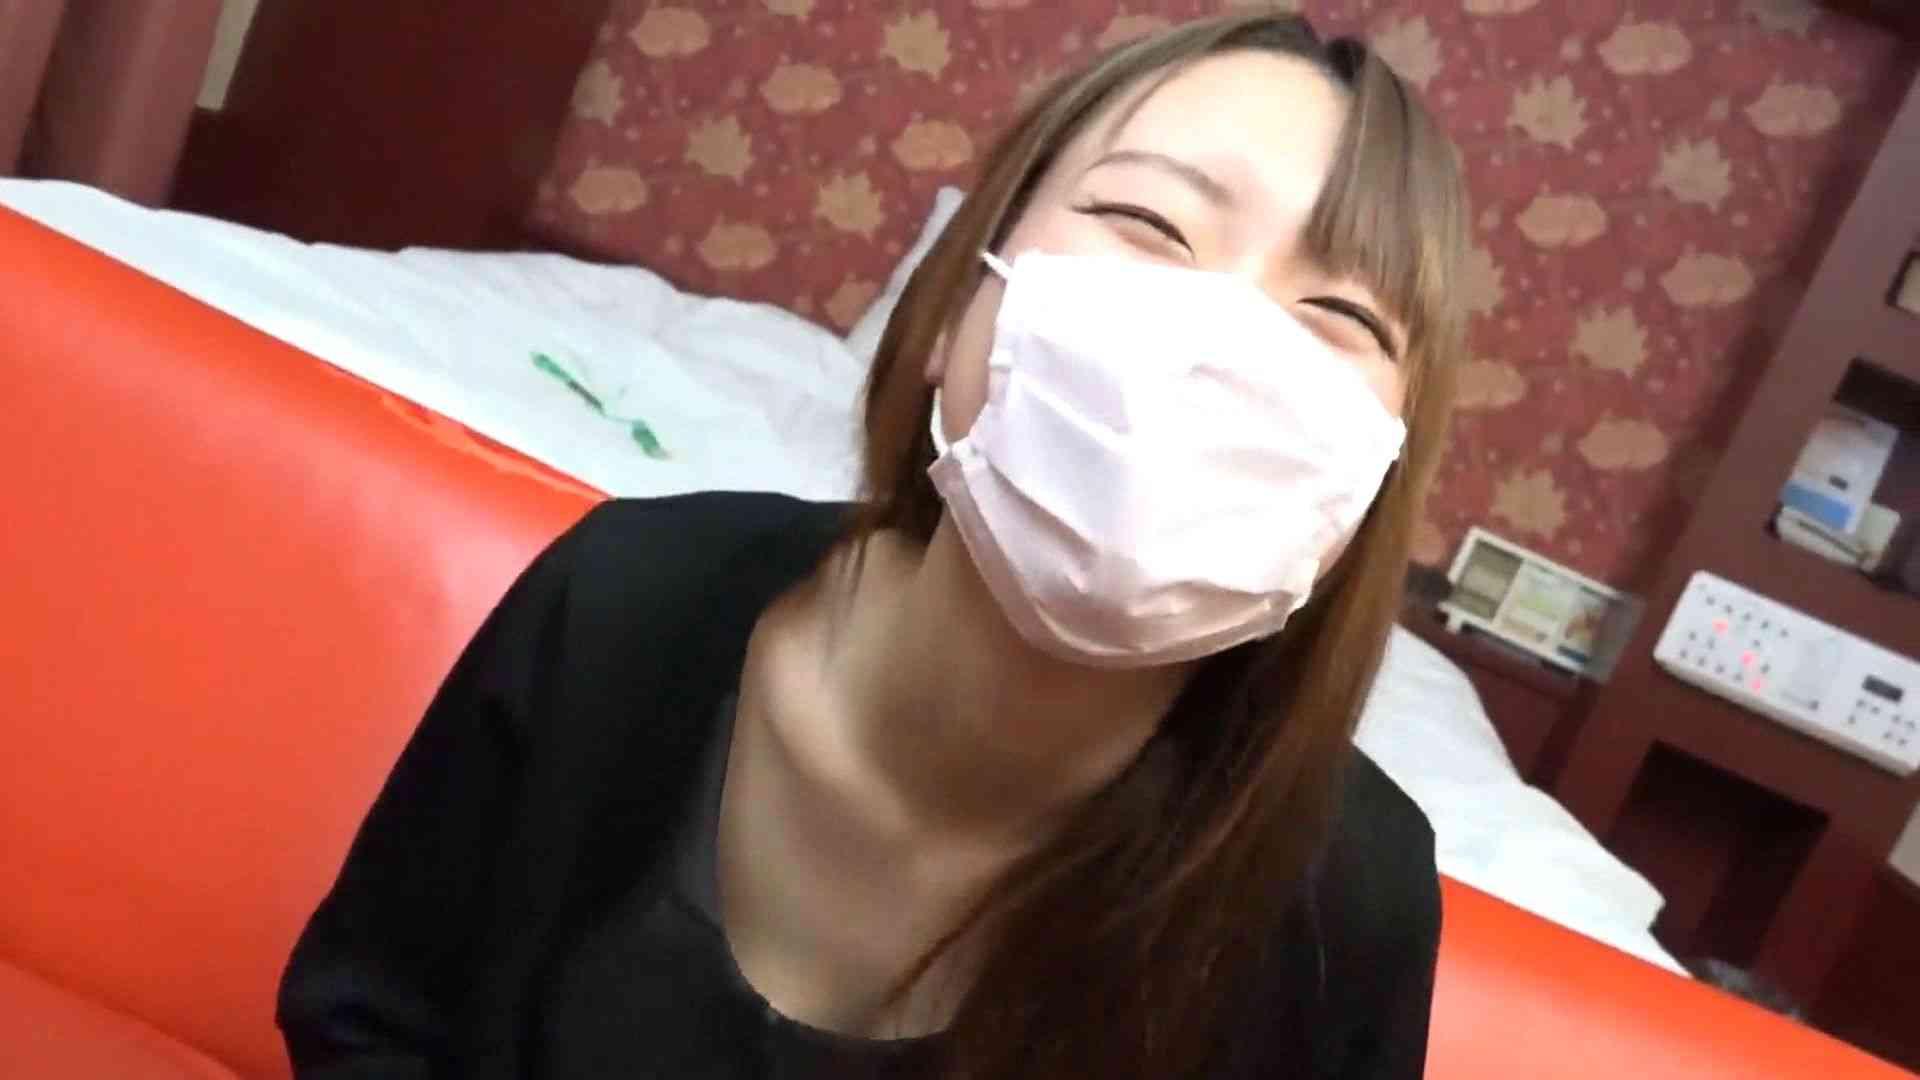 S級厳選美女ビッチガールVol.40 前編 美女 | OLの実態  86pic 5